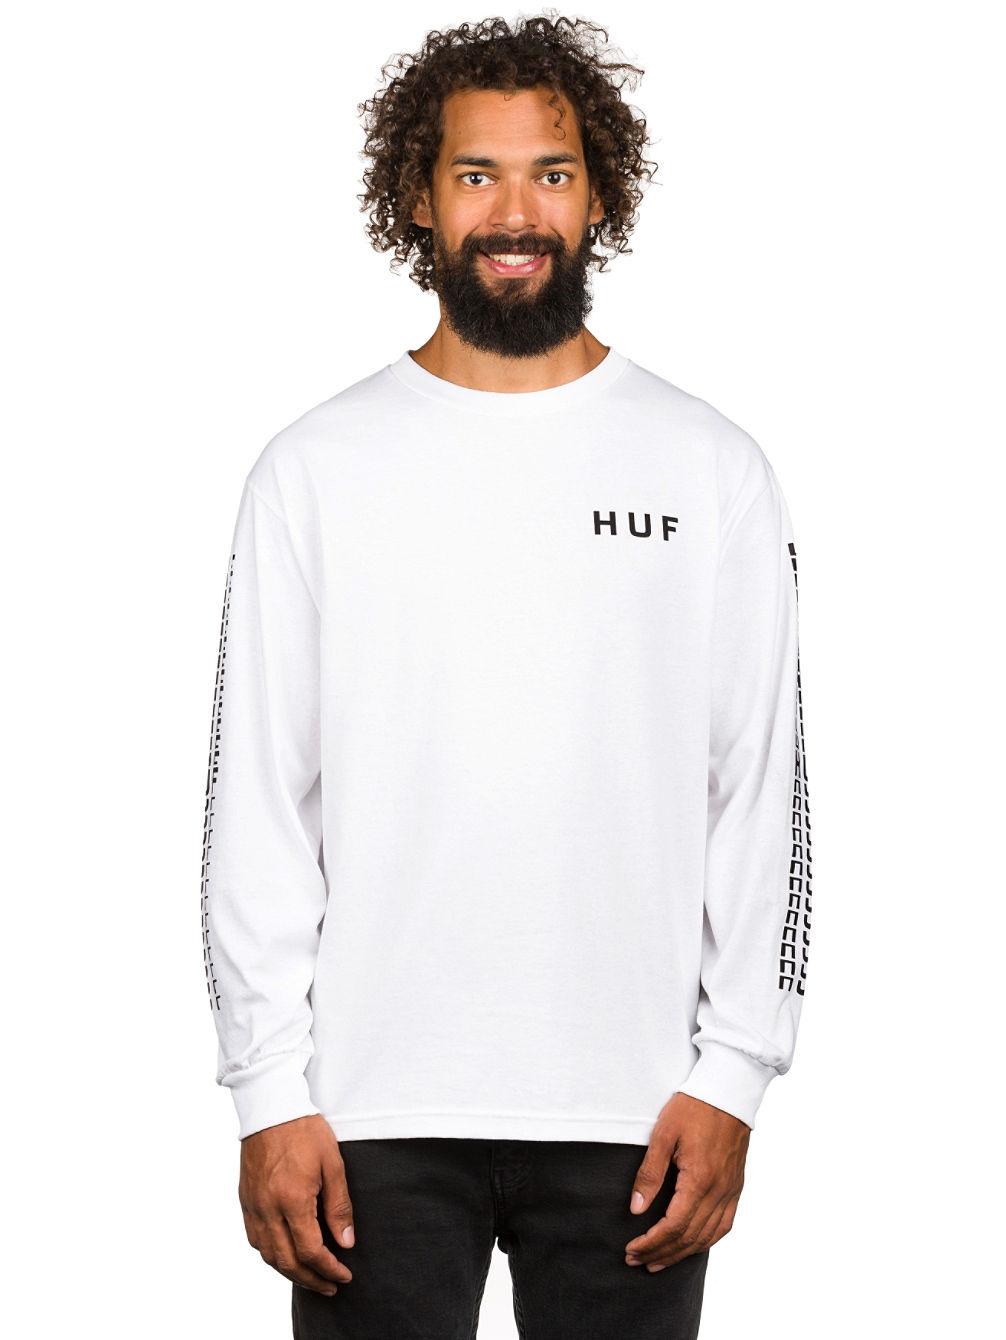 huf-sante-t-shirt-ls